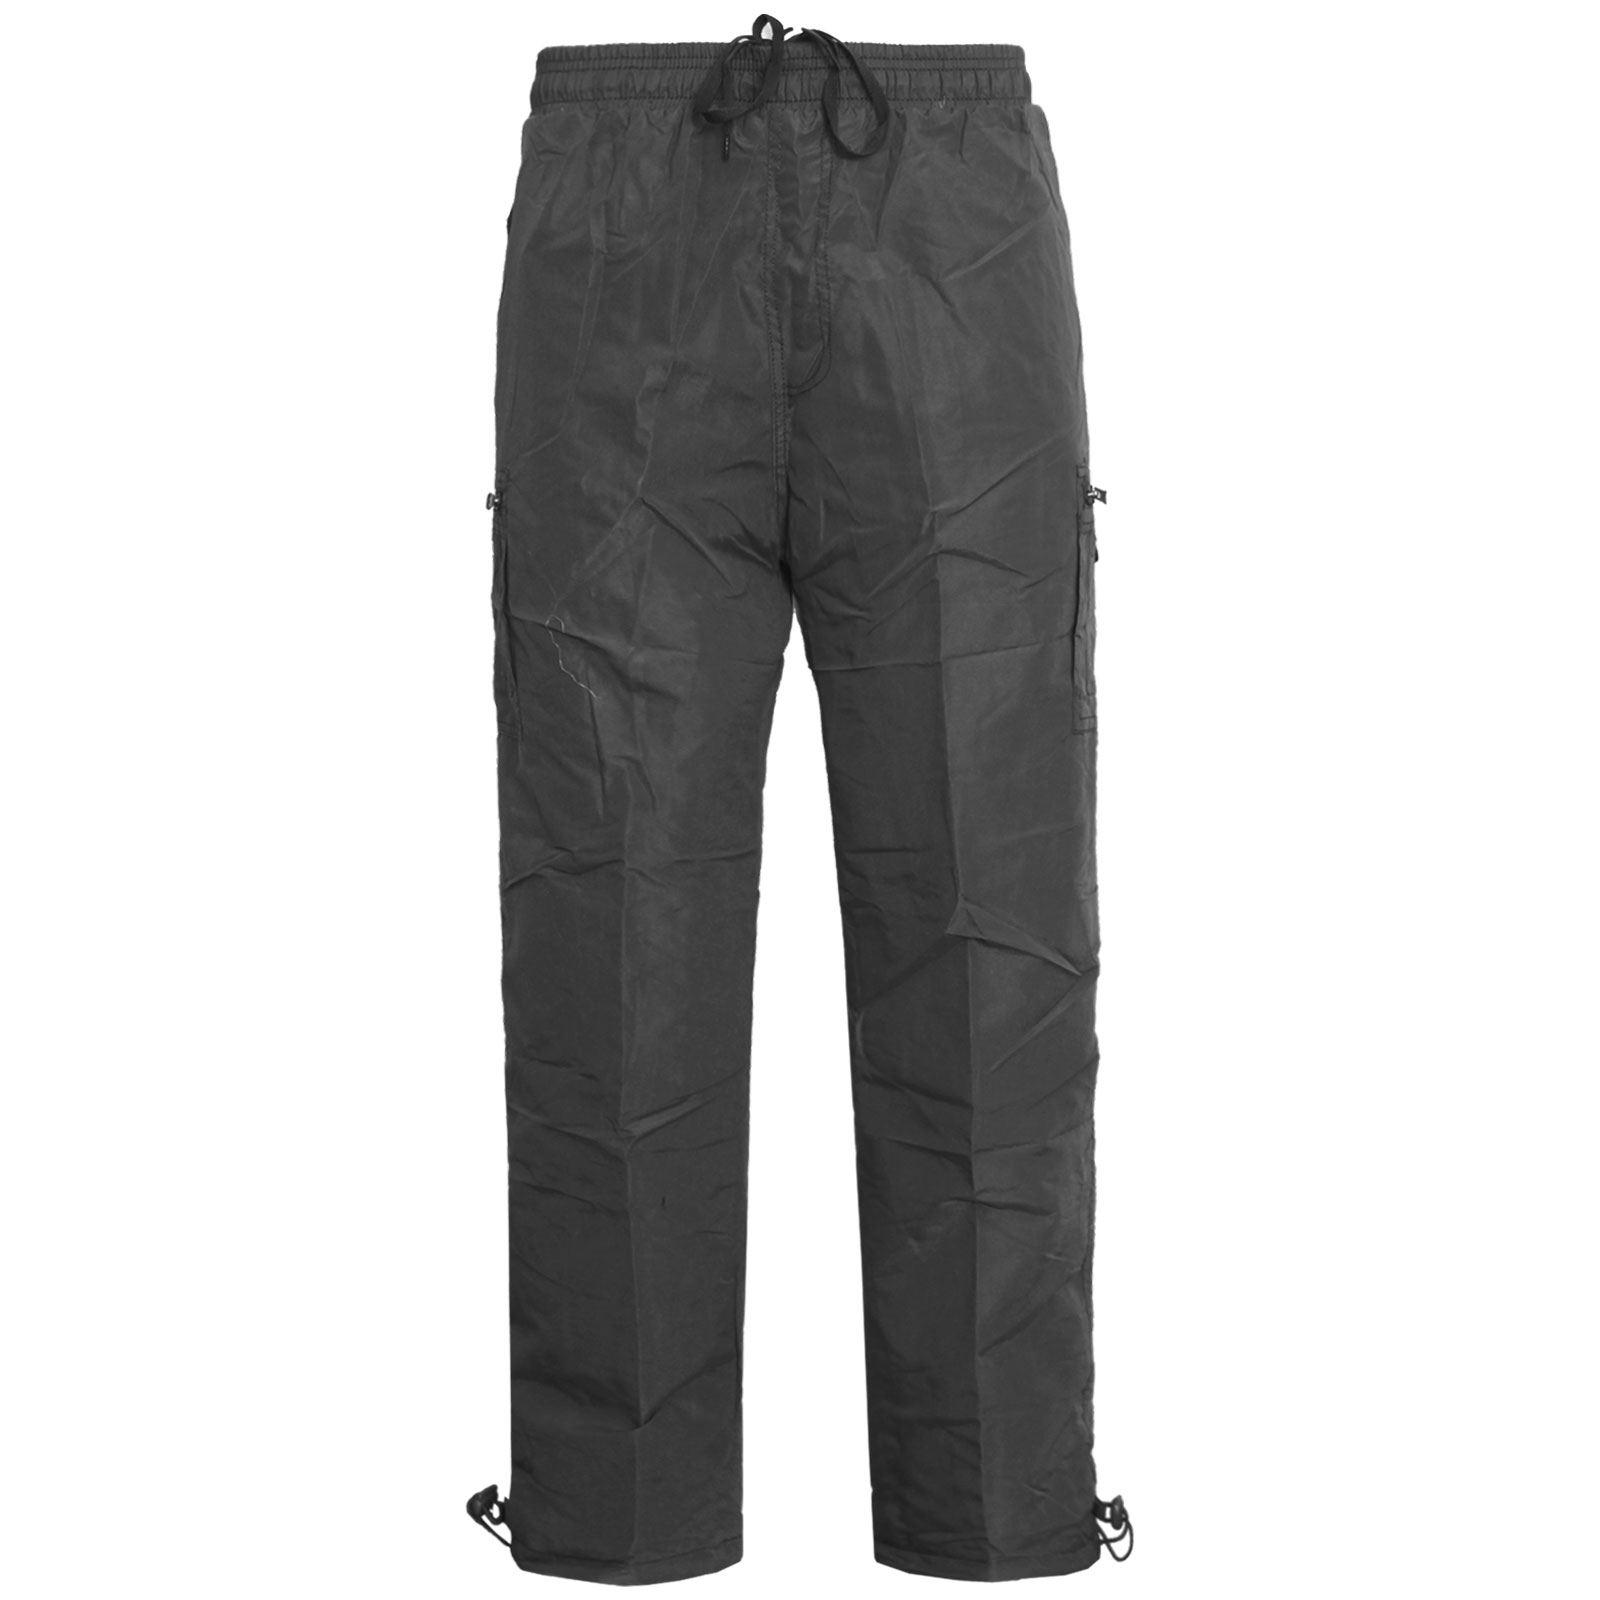 Mens Elasticated Fleece Lined Thermal Walking Cargo Combat Winter Warm Trousers